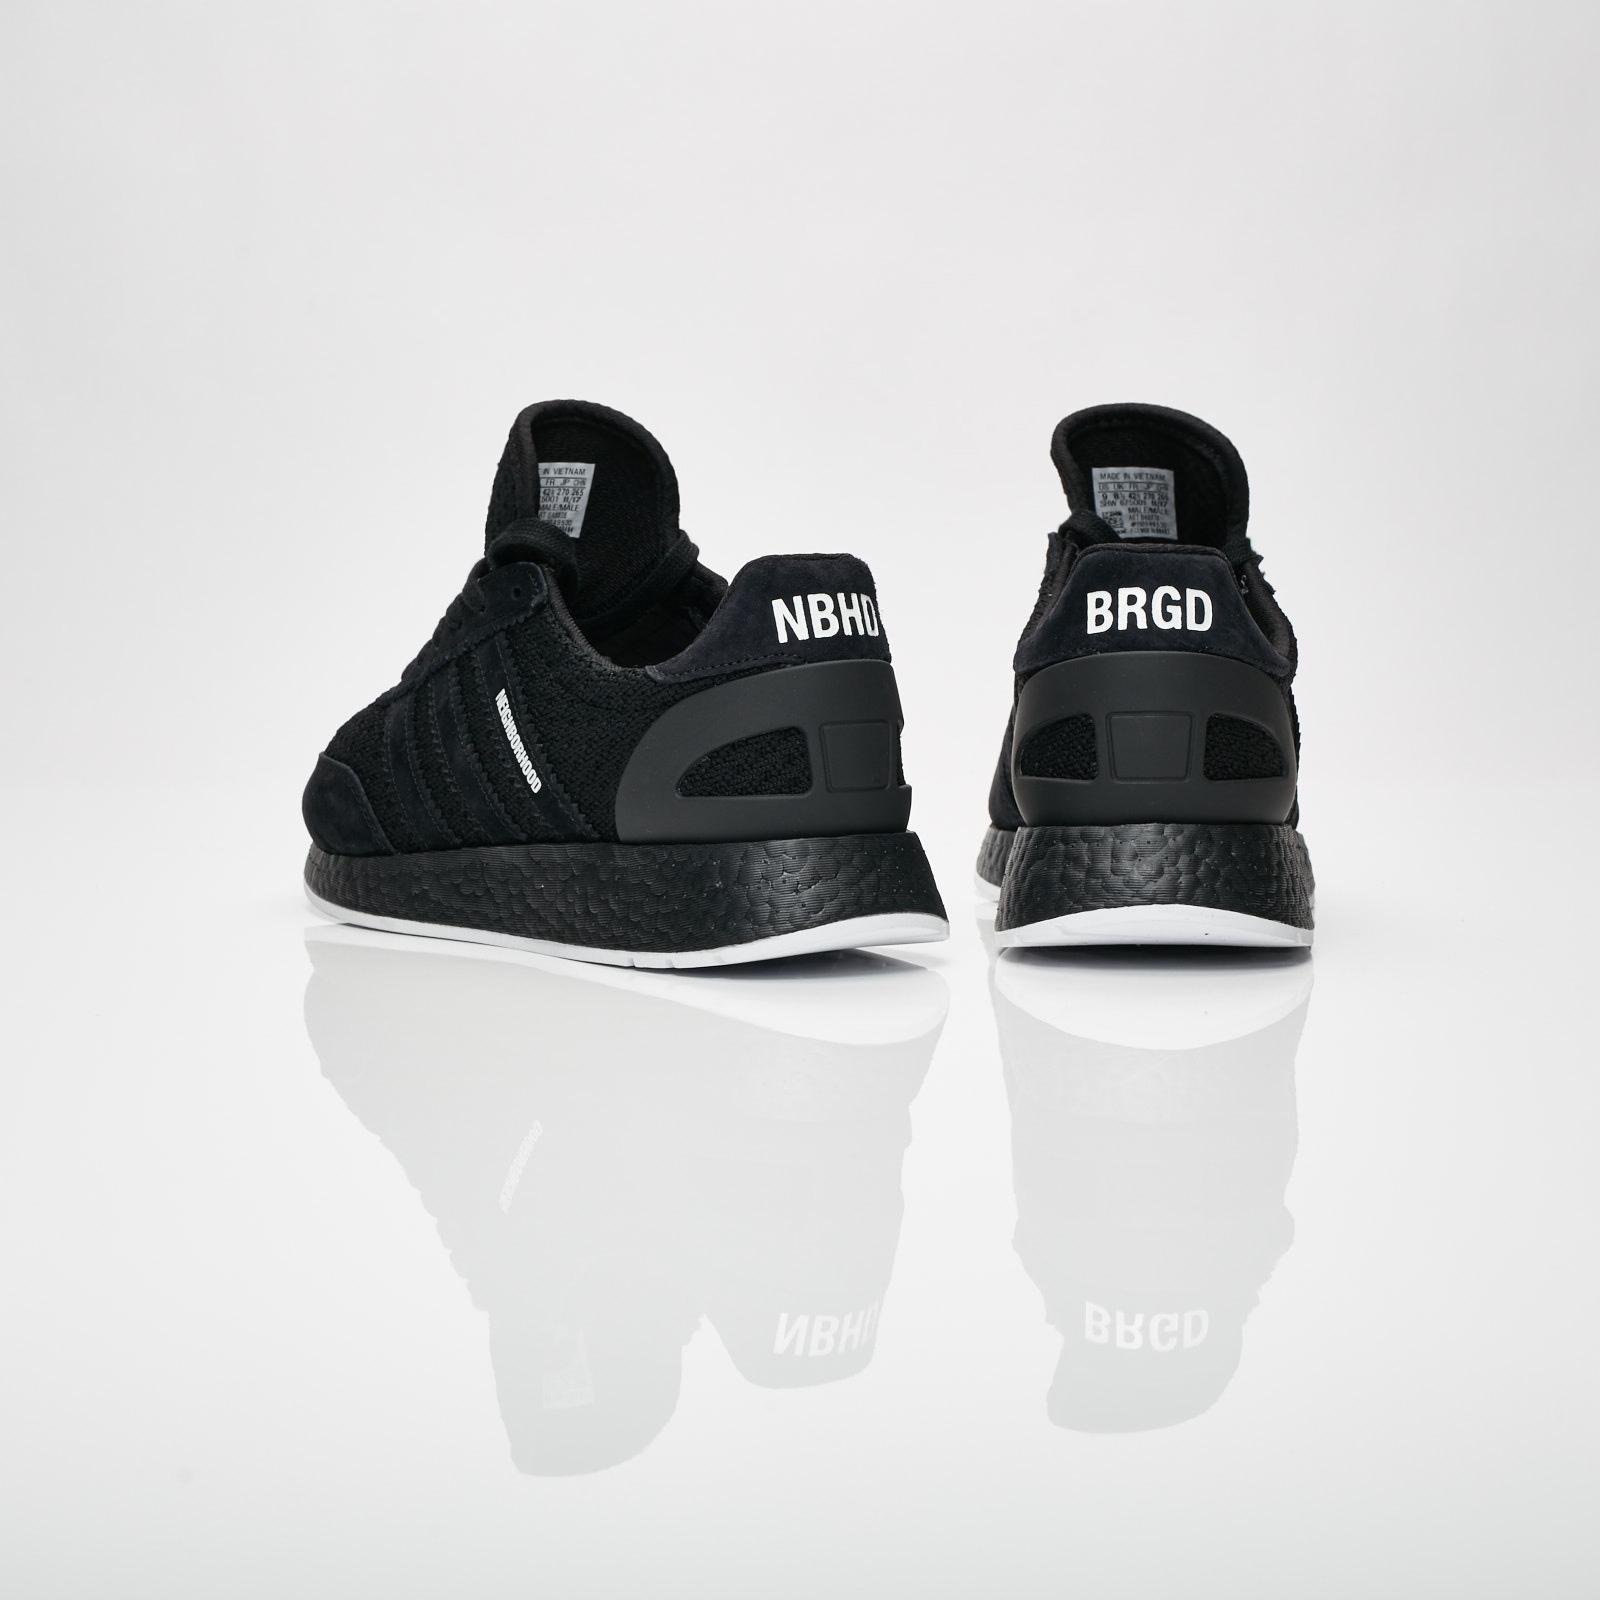 4650dce8bb59 adidas I-5923 x Neighborhood - Da8838 - Sneakersnstuff